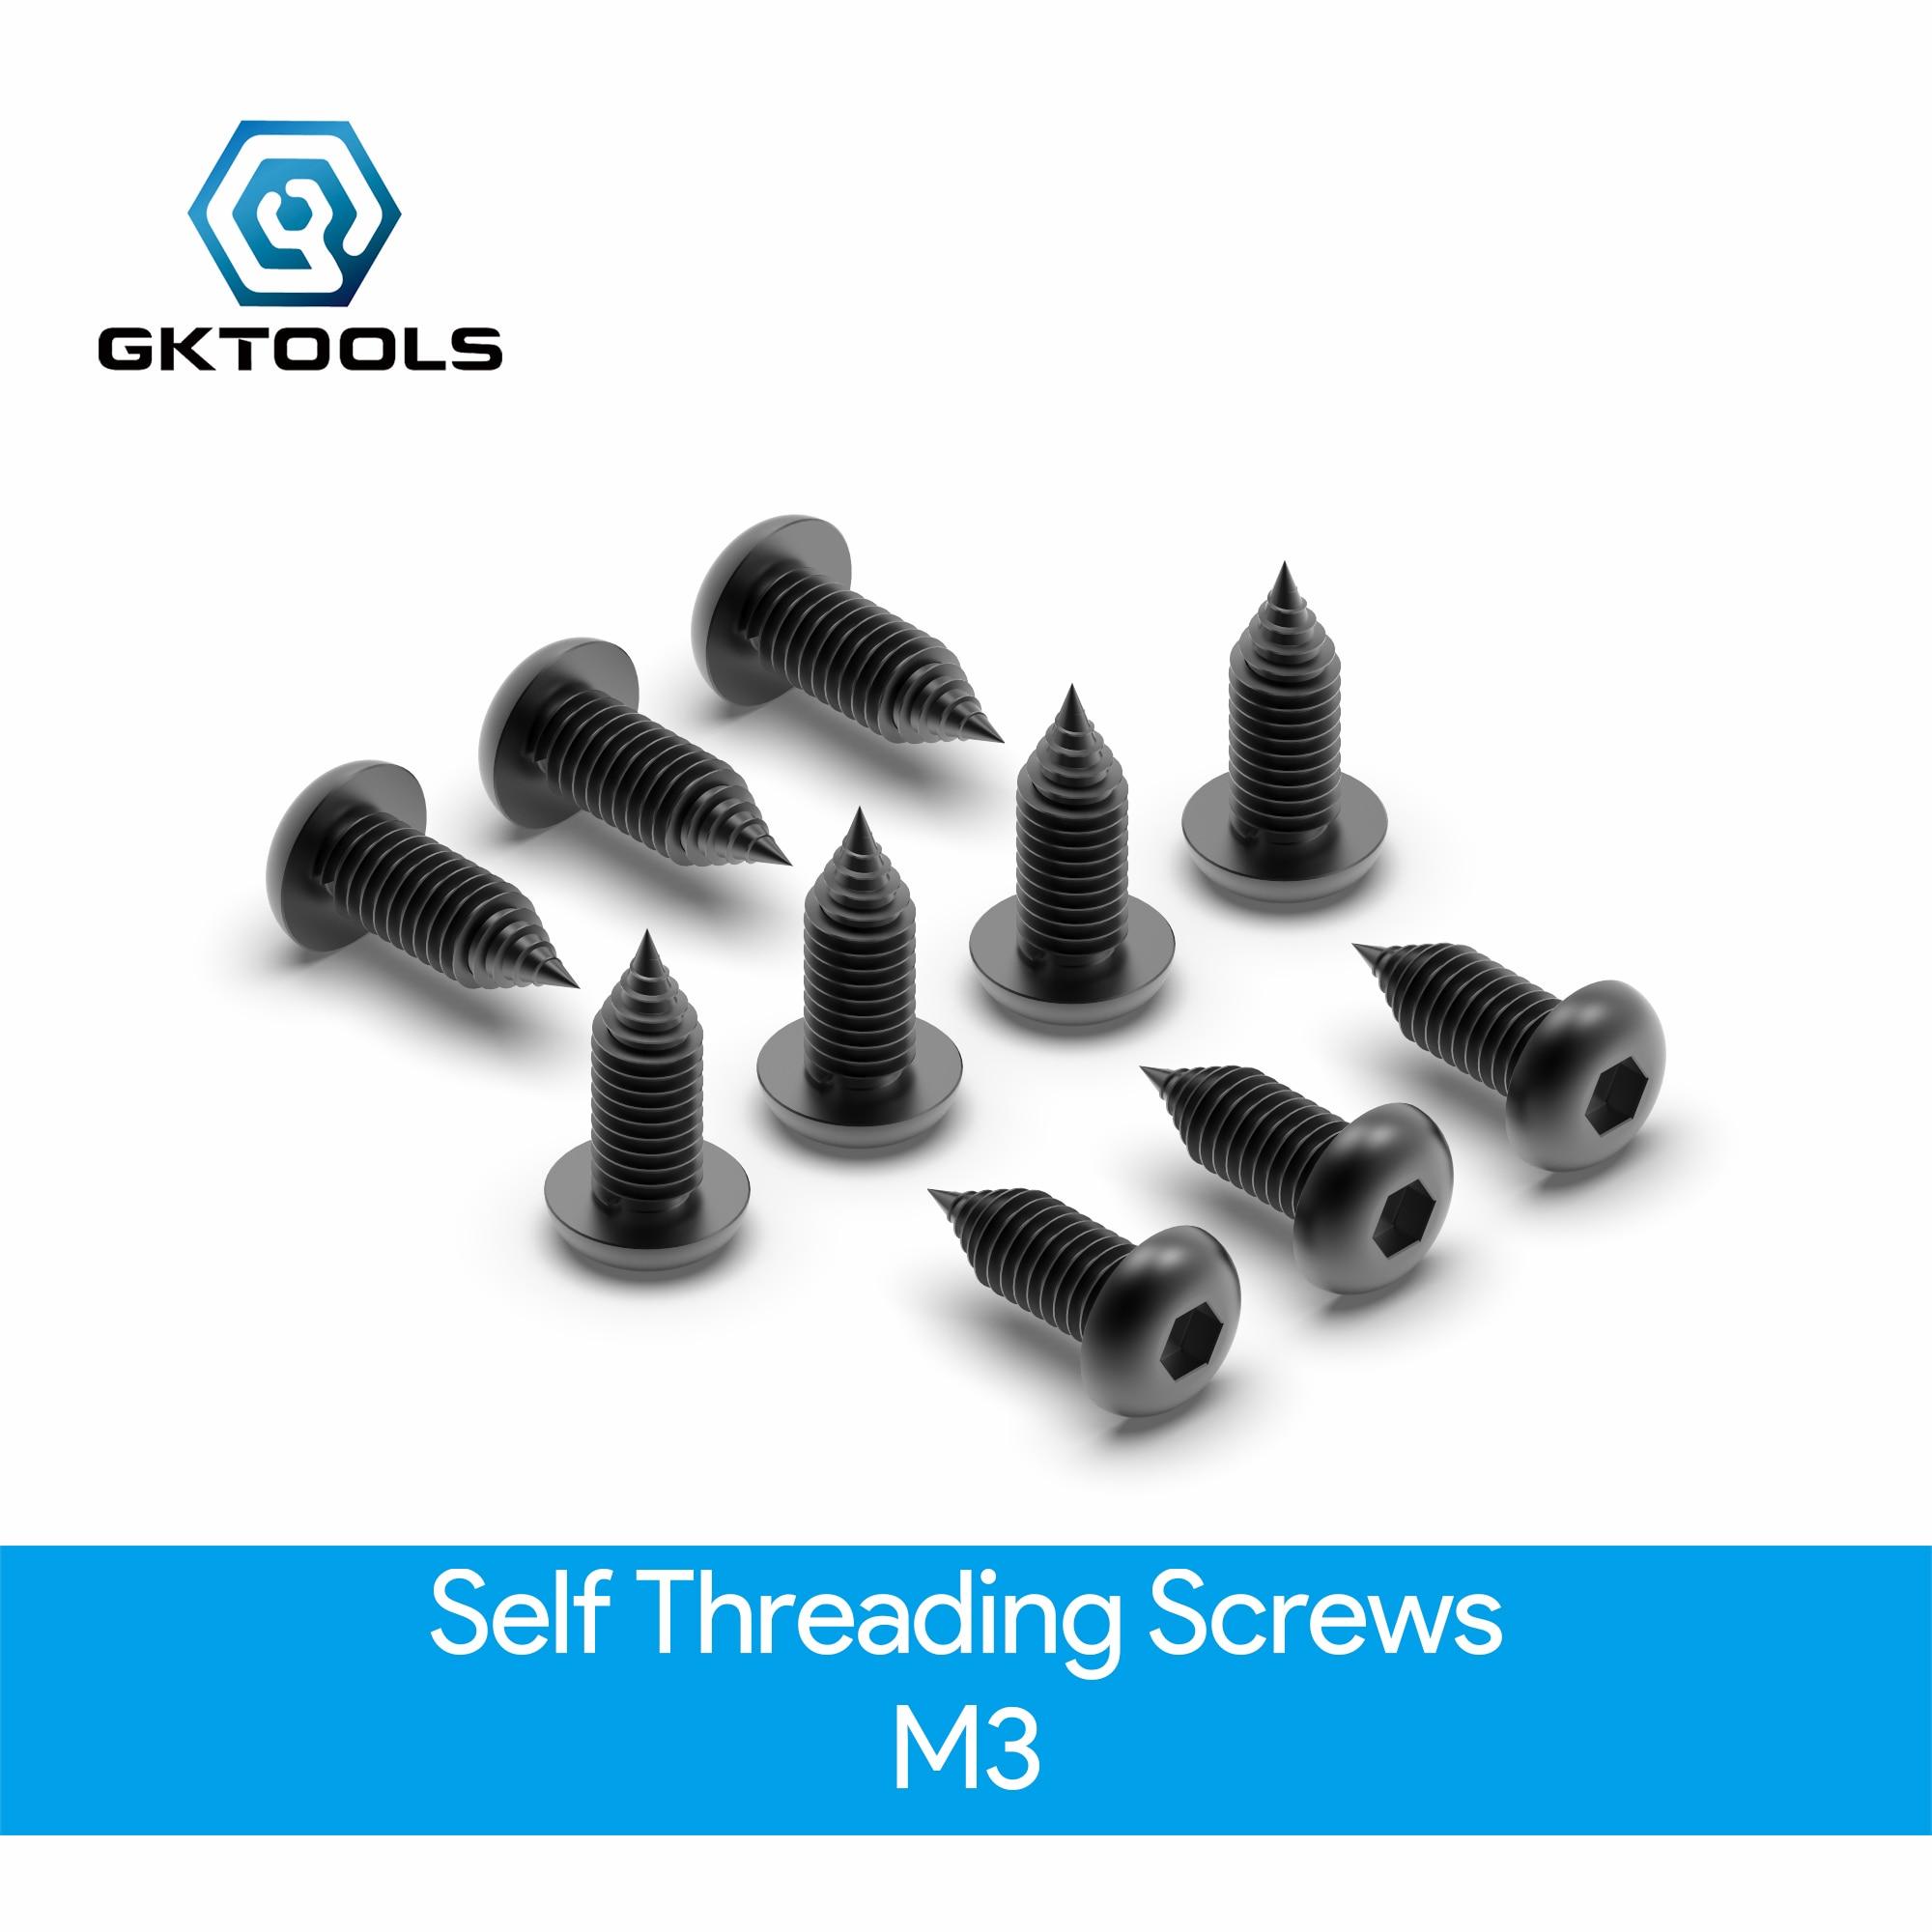 OpenBuilds Self Threading Screws - M3 (10 Pack)